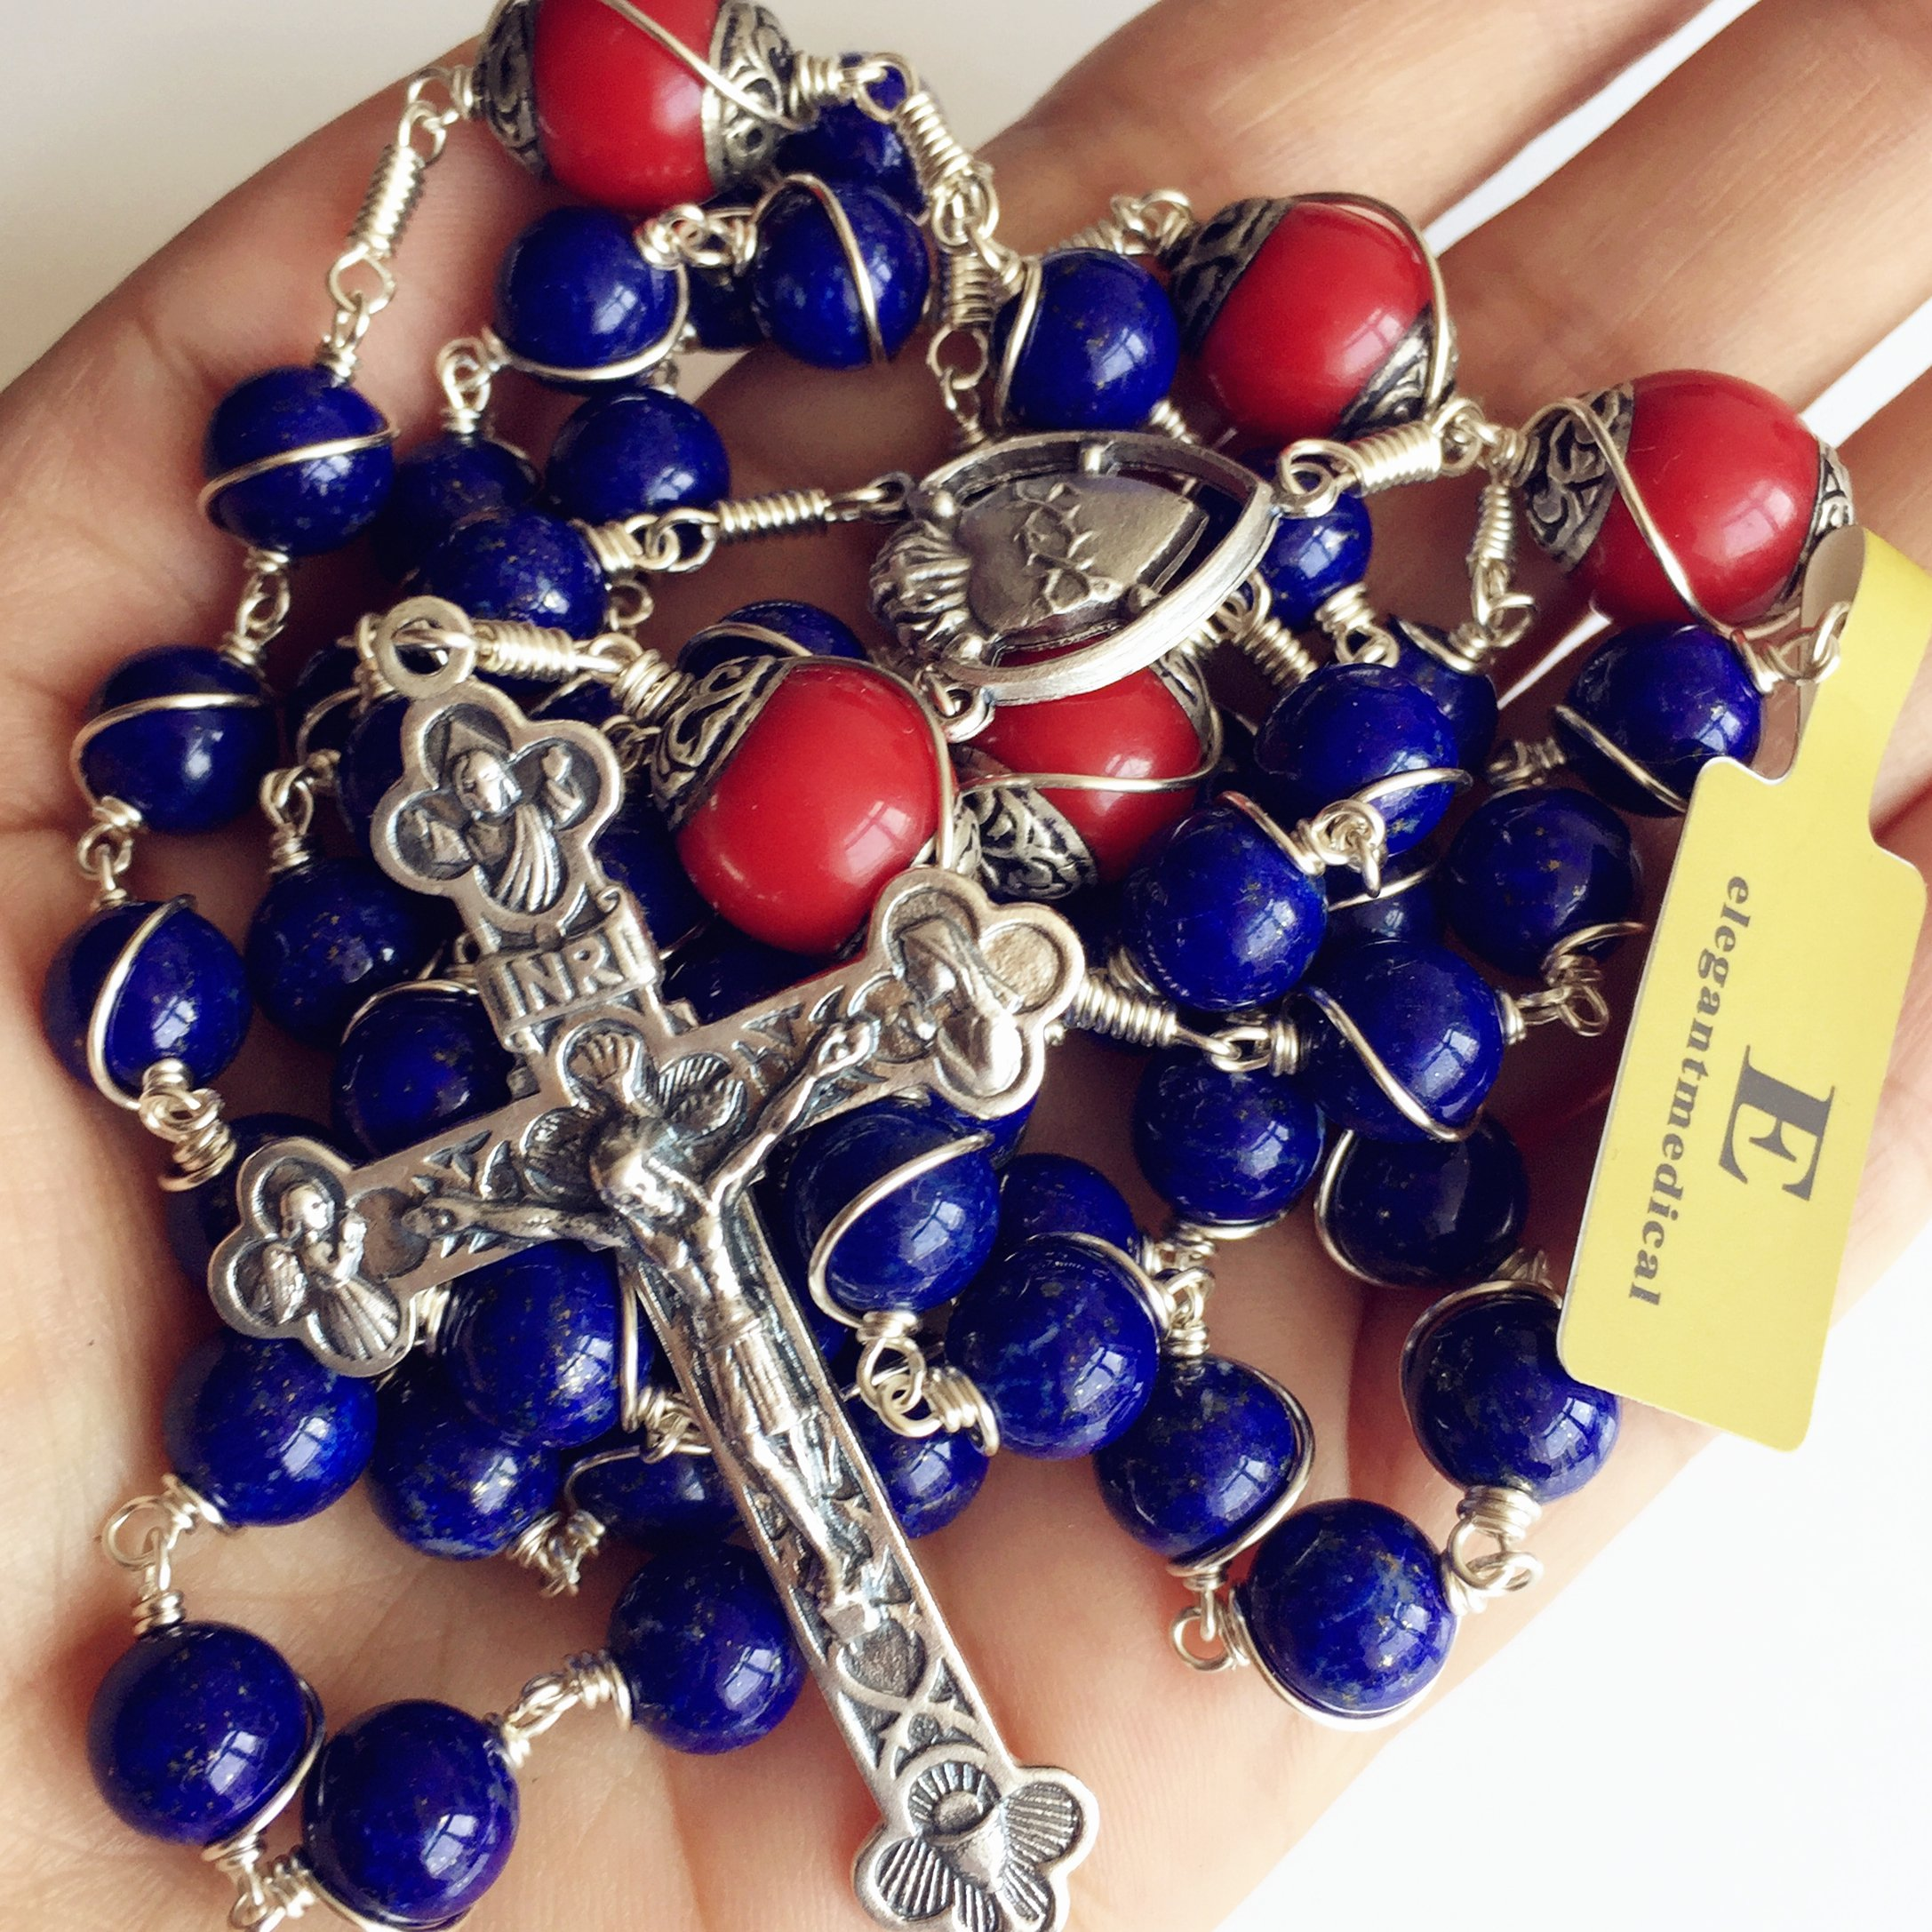 Handmade Sterling 925 Silver Lapis Lazuli Beads Rosary Cross Crucifix Catholic Necklace Gifts by elegantmedical (Image #5)